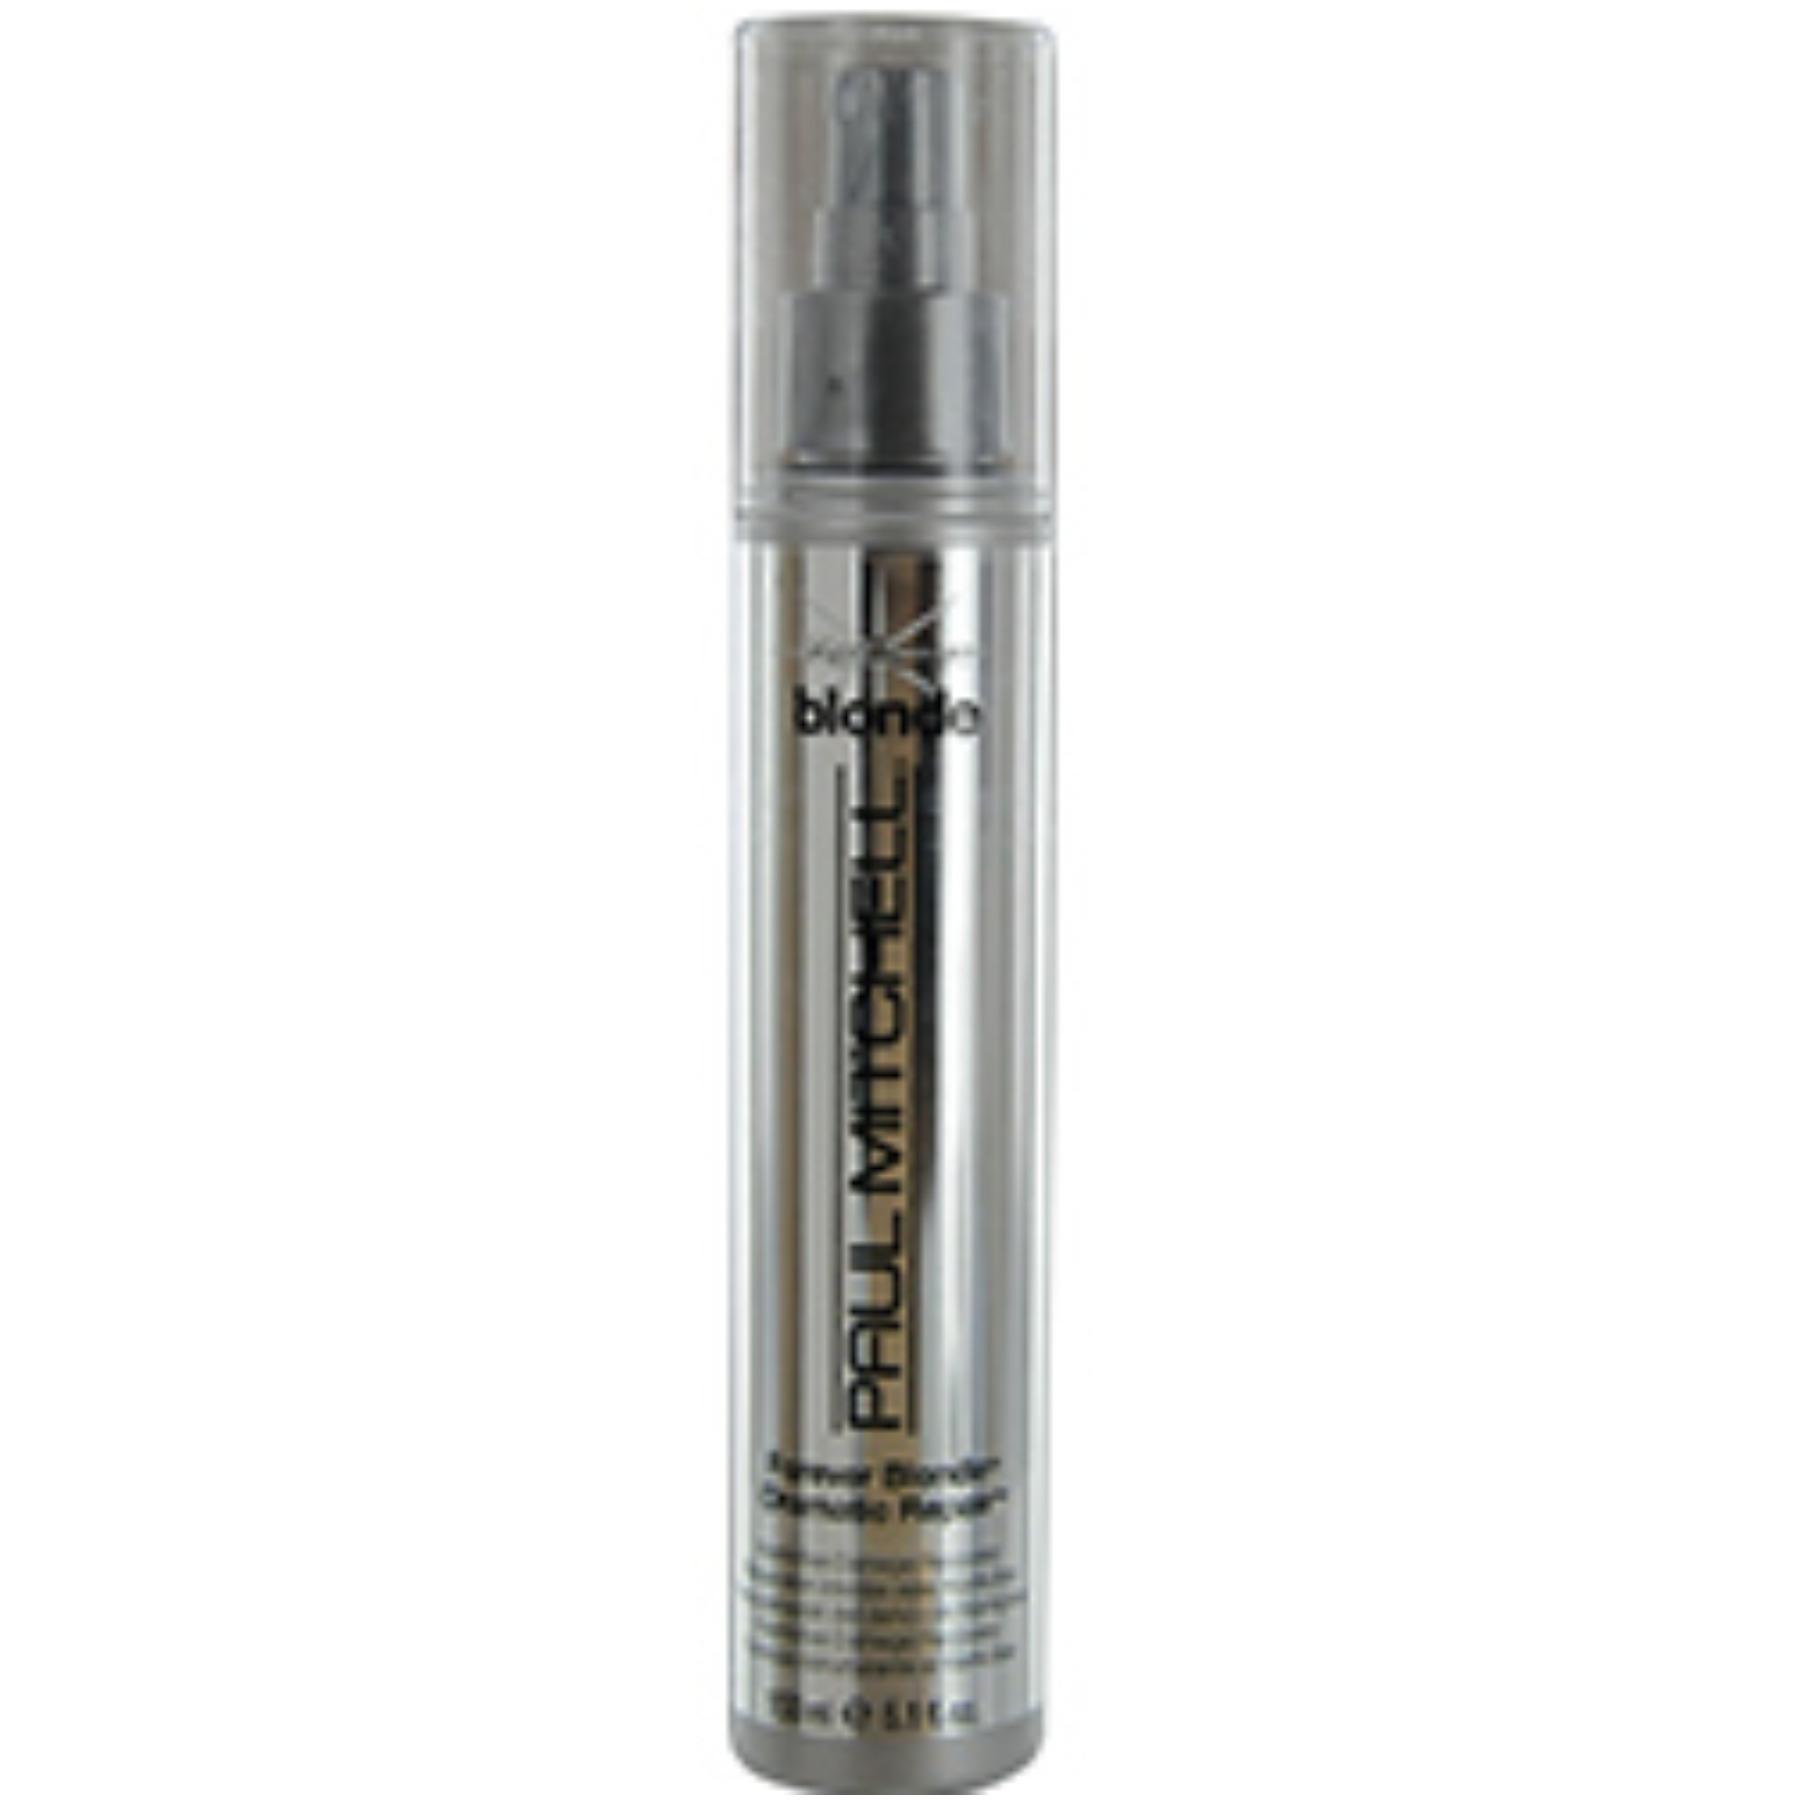 Forever Blonde Dramatic Repair Spray